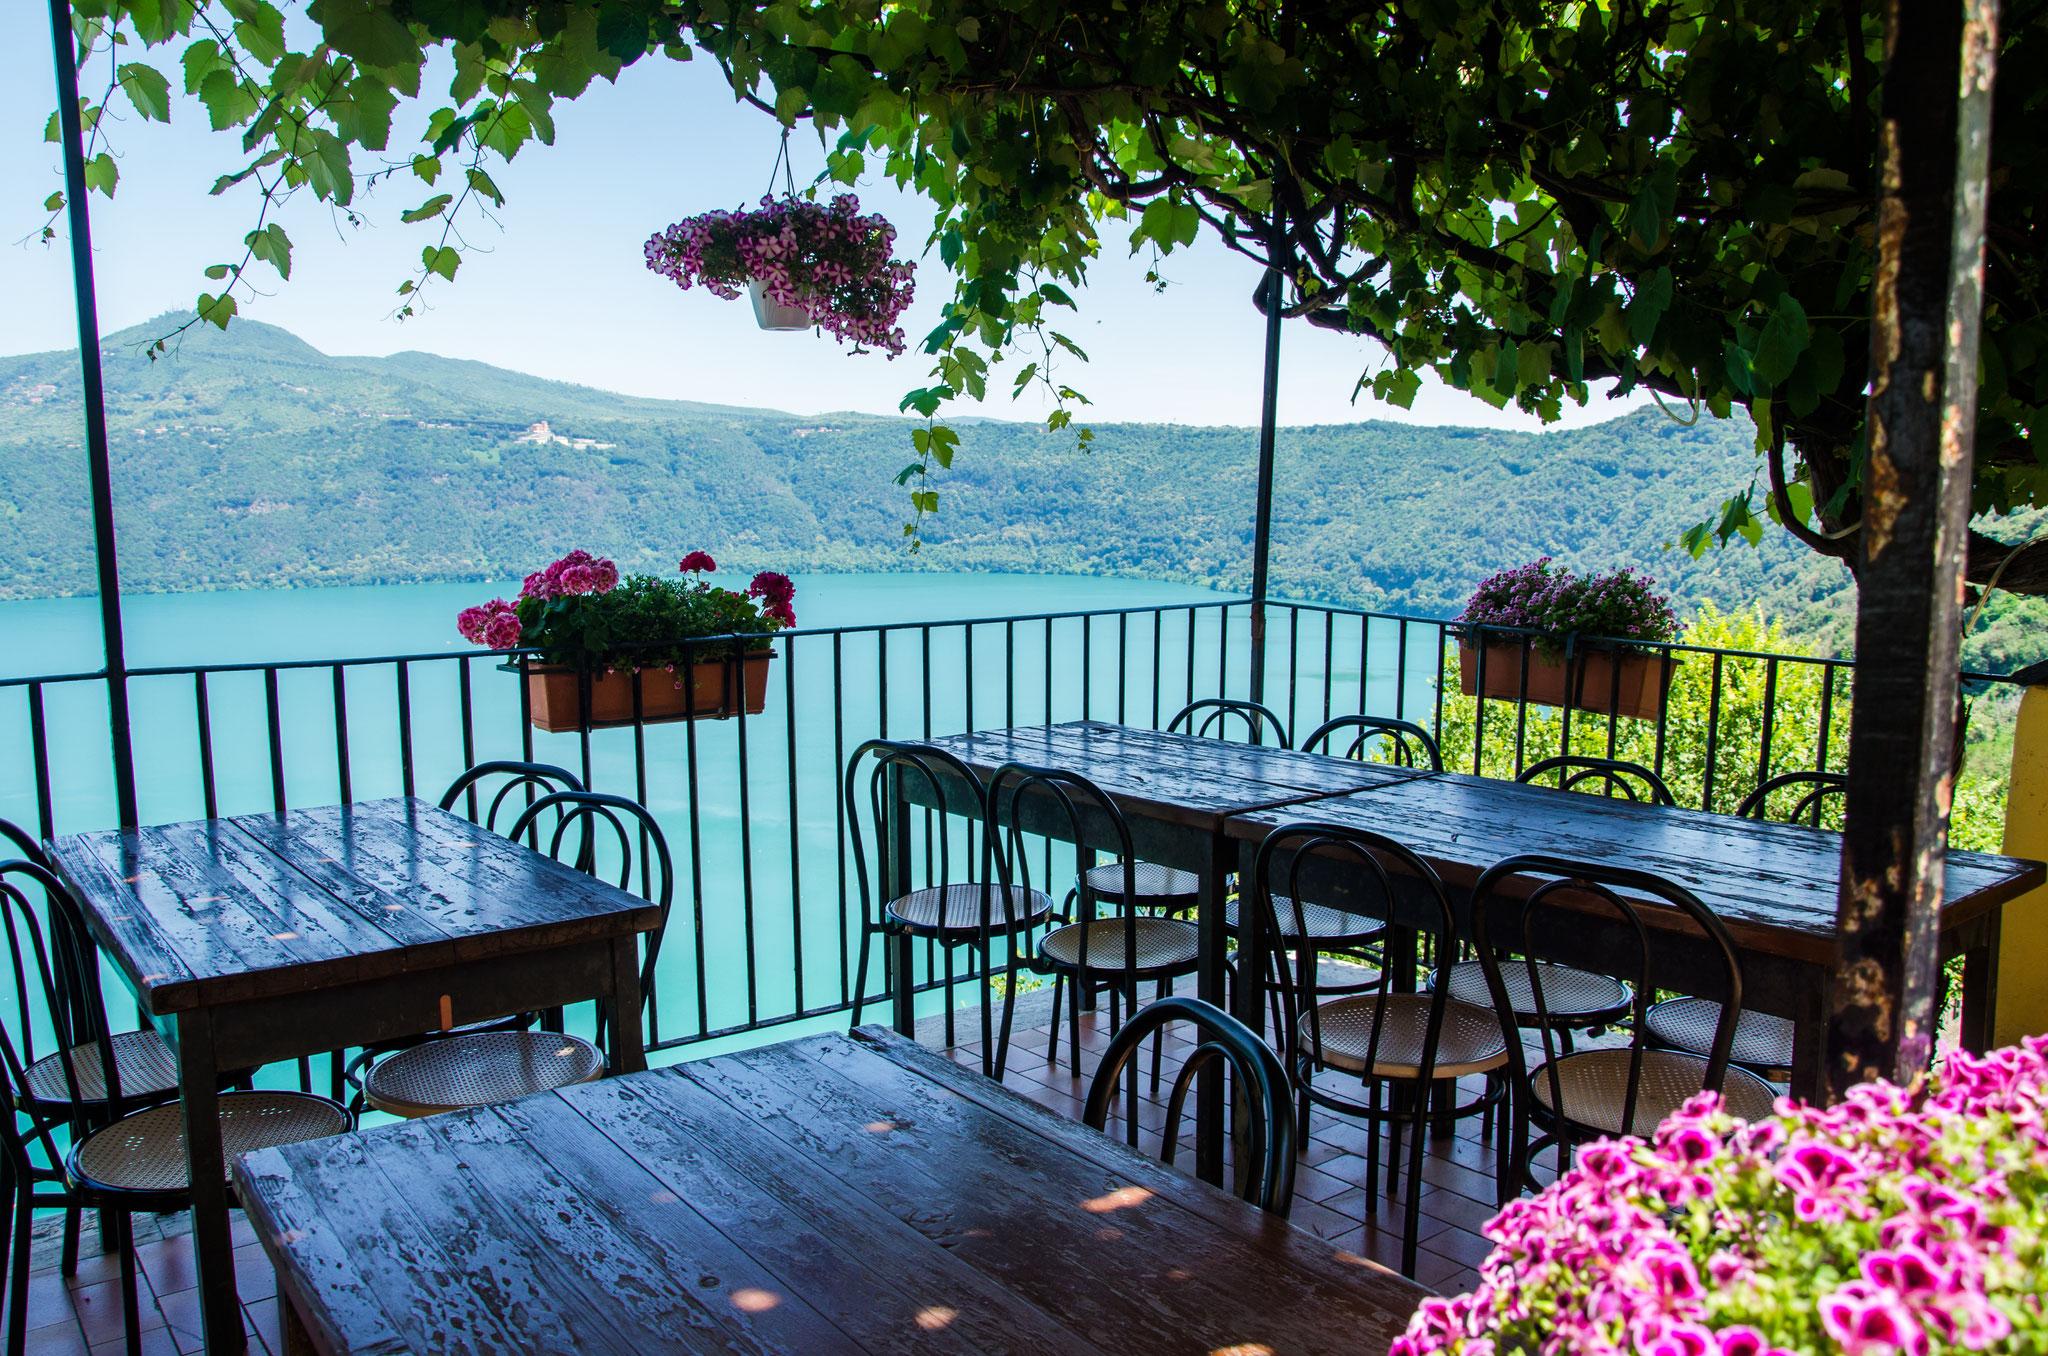 view of the Albano lake